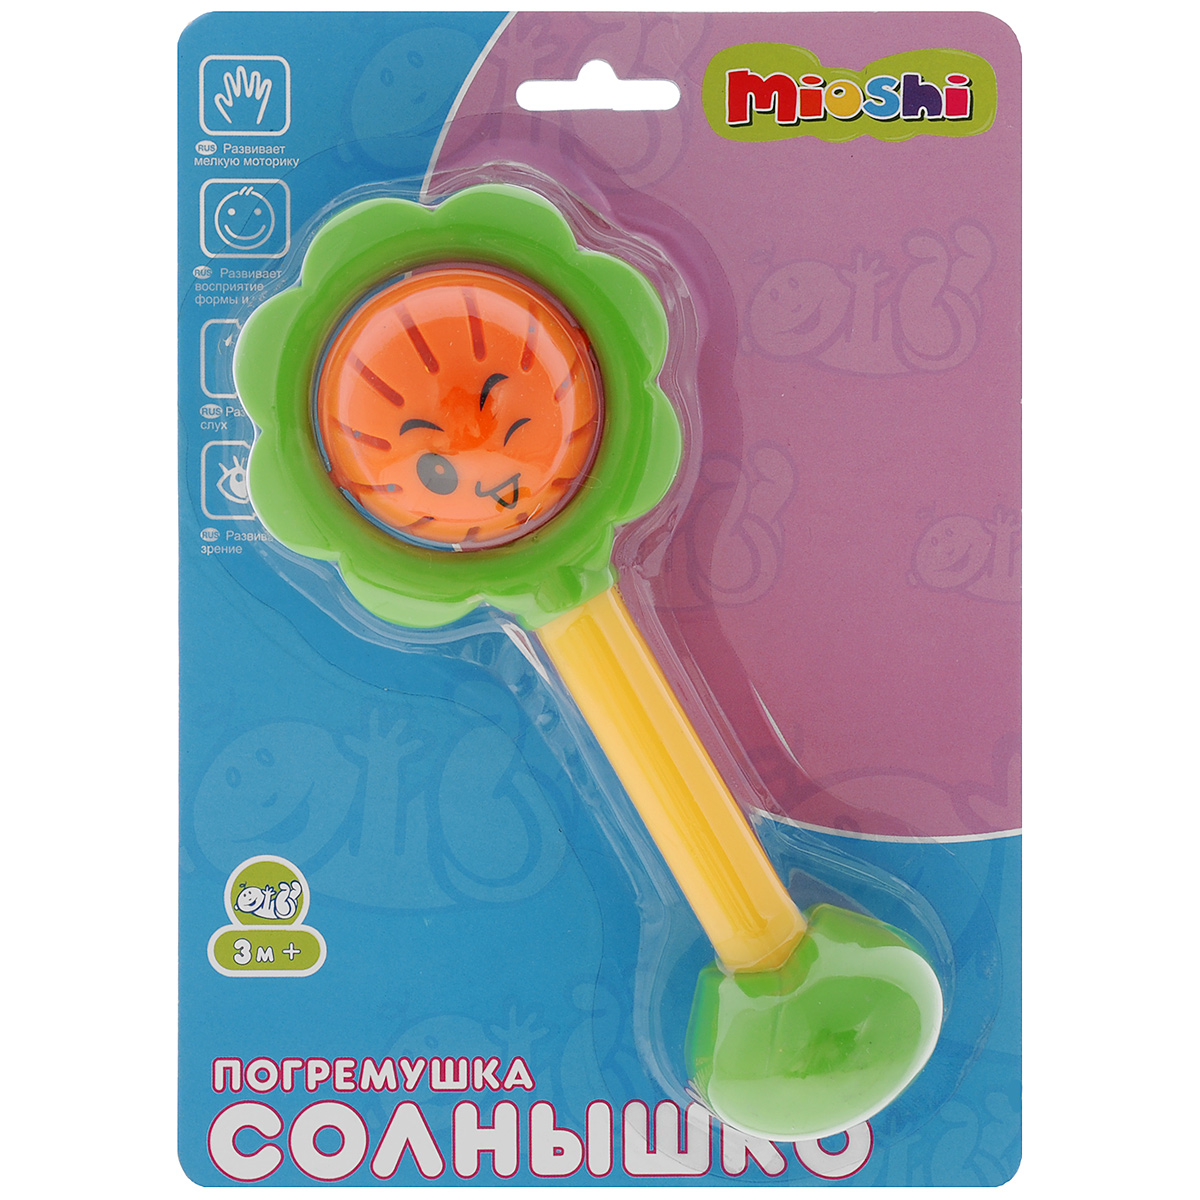 Развивающая игрушка-погремушка Mioshi Солнышко развивающая игрушка погремушка mioshi черепашка